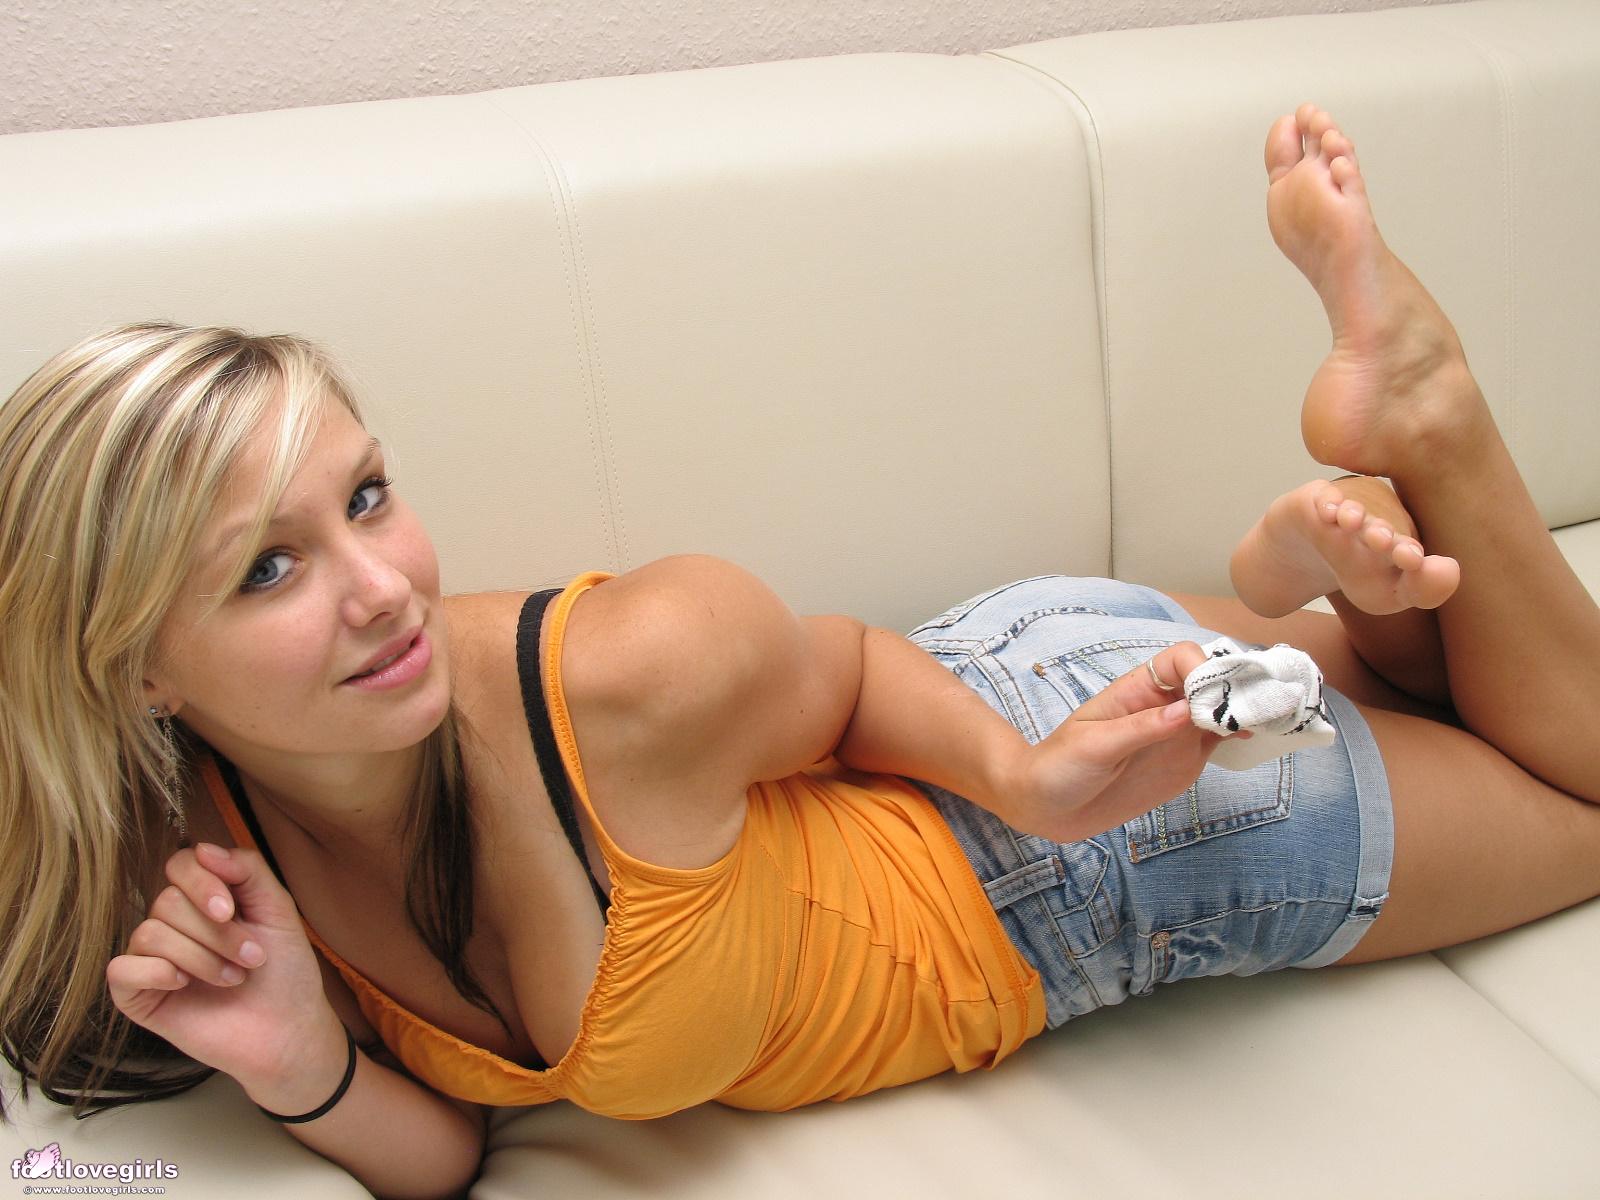 nude prono philipinnes girls